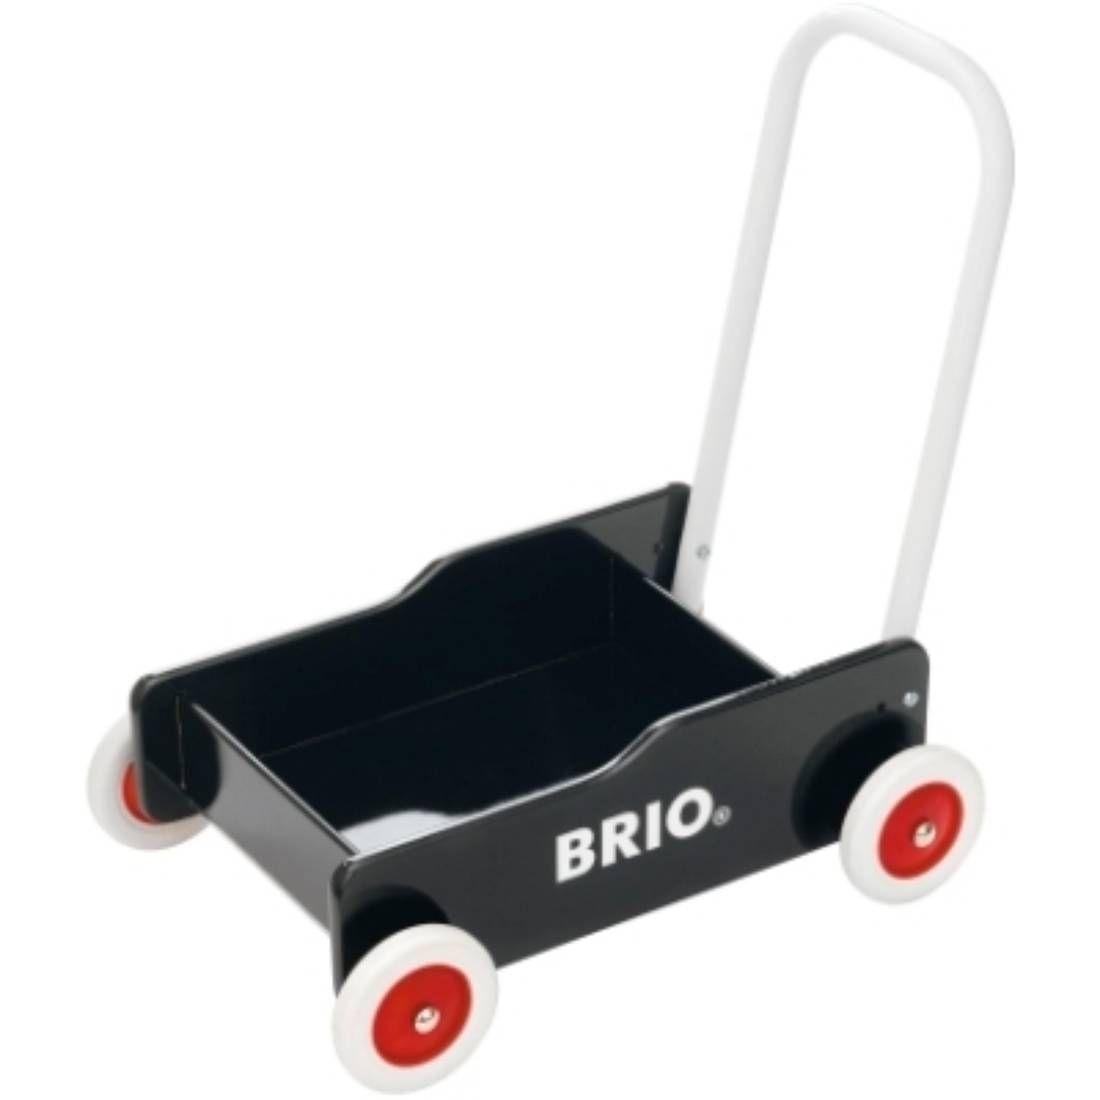 BRIO Toodler wobbler